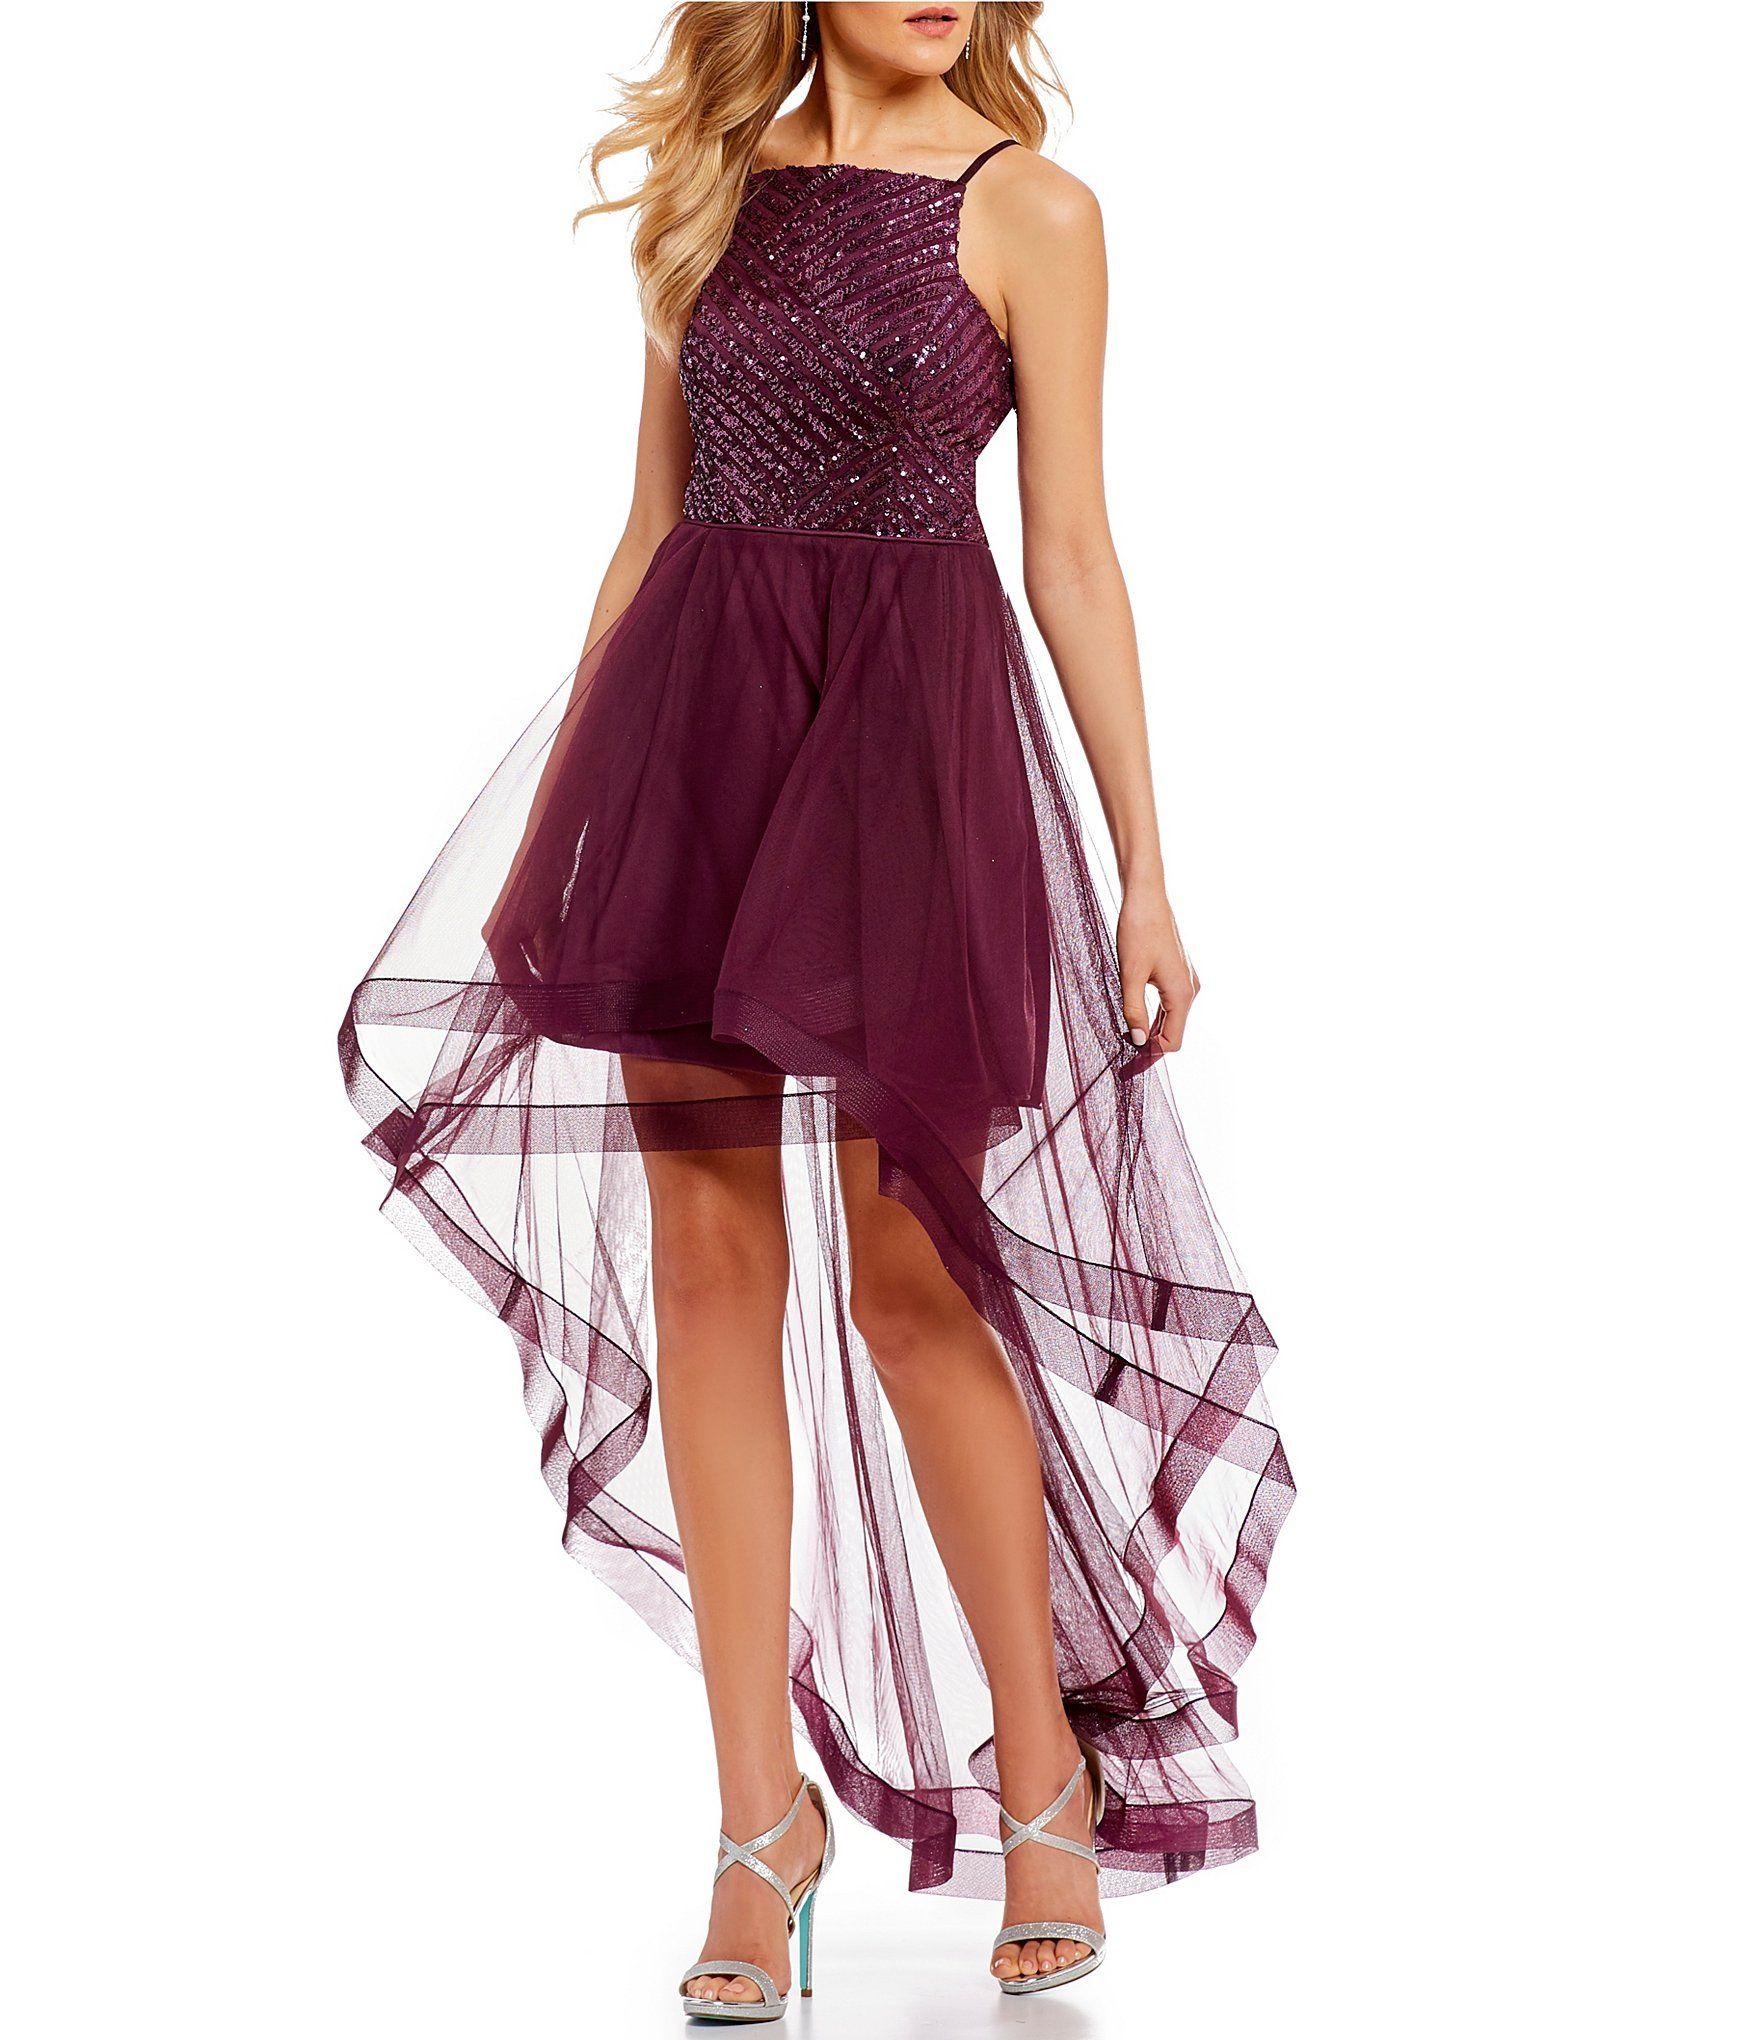 f675c760ac2 Shop for Jodi Kristopher Sequin Pattern Bodice Long High-Low Dress at  Dillards.com